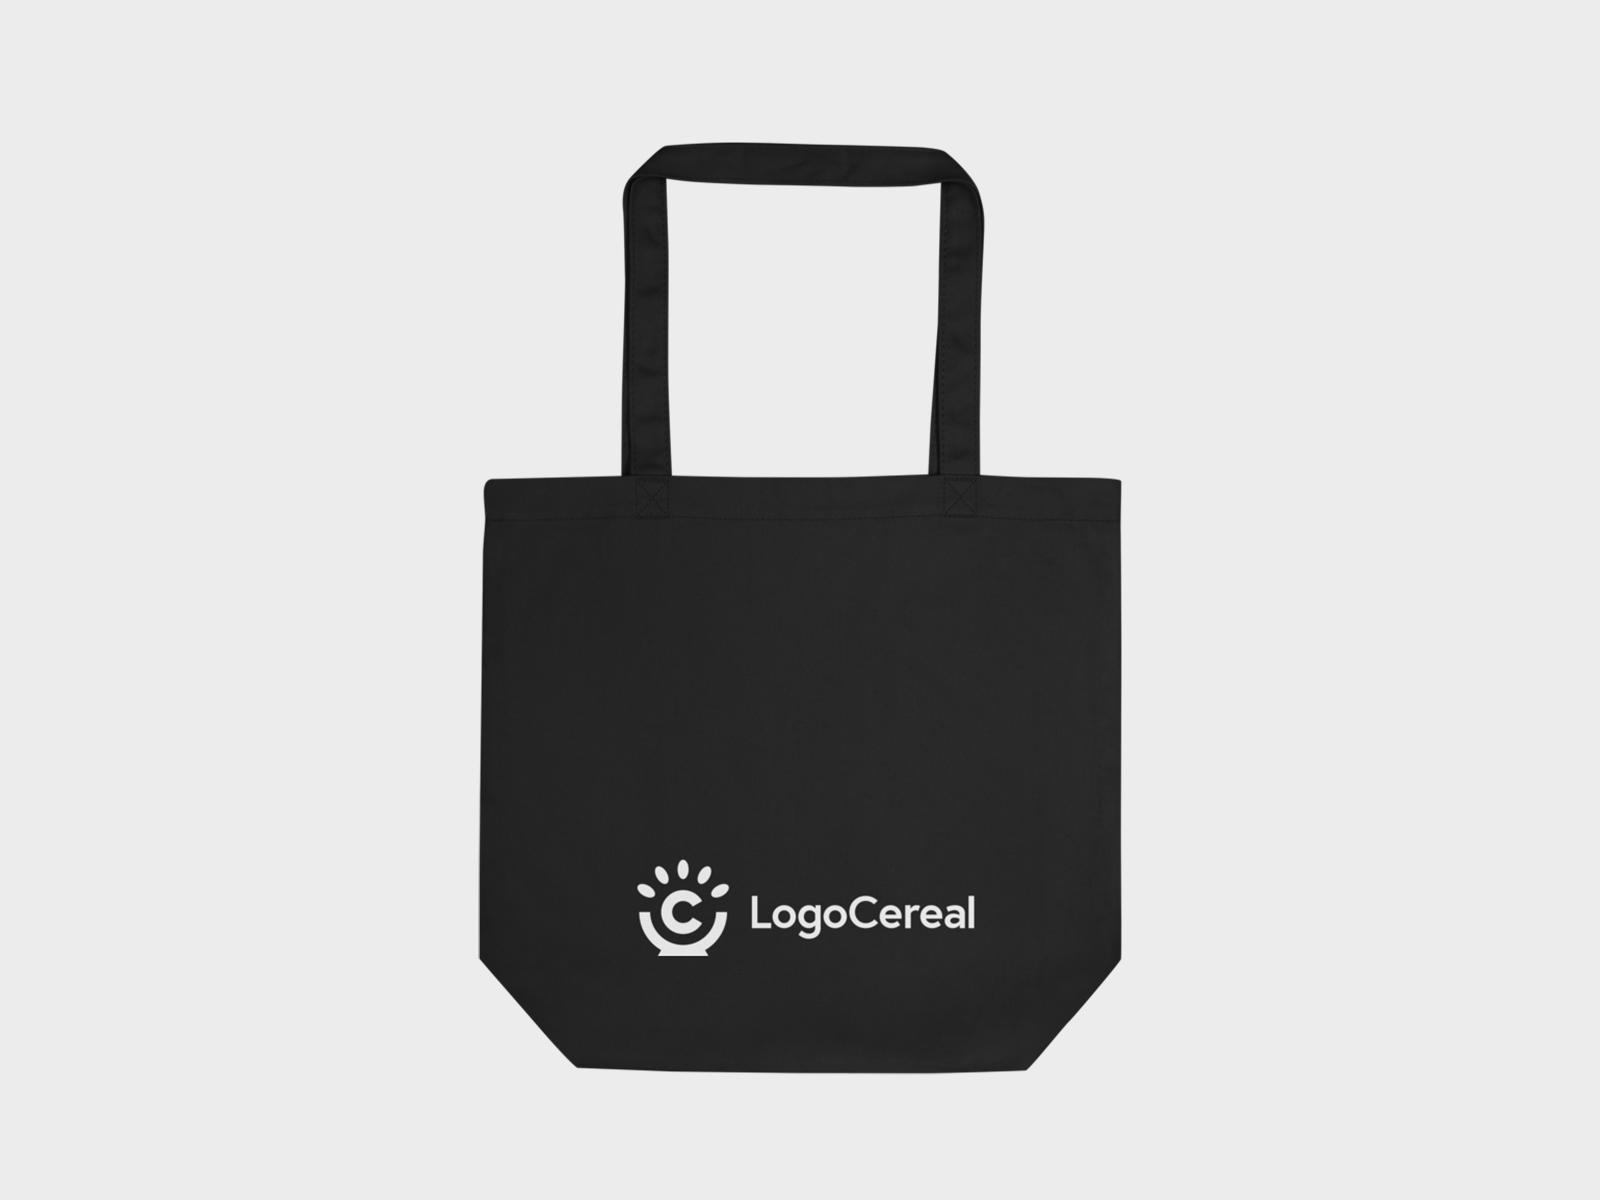 LogoCereal Icon Tote Bag